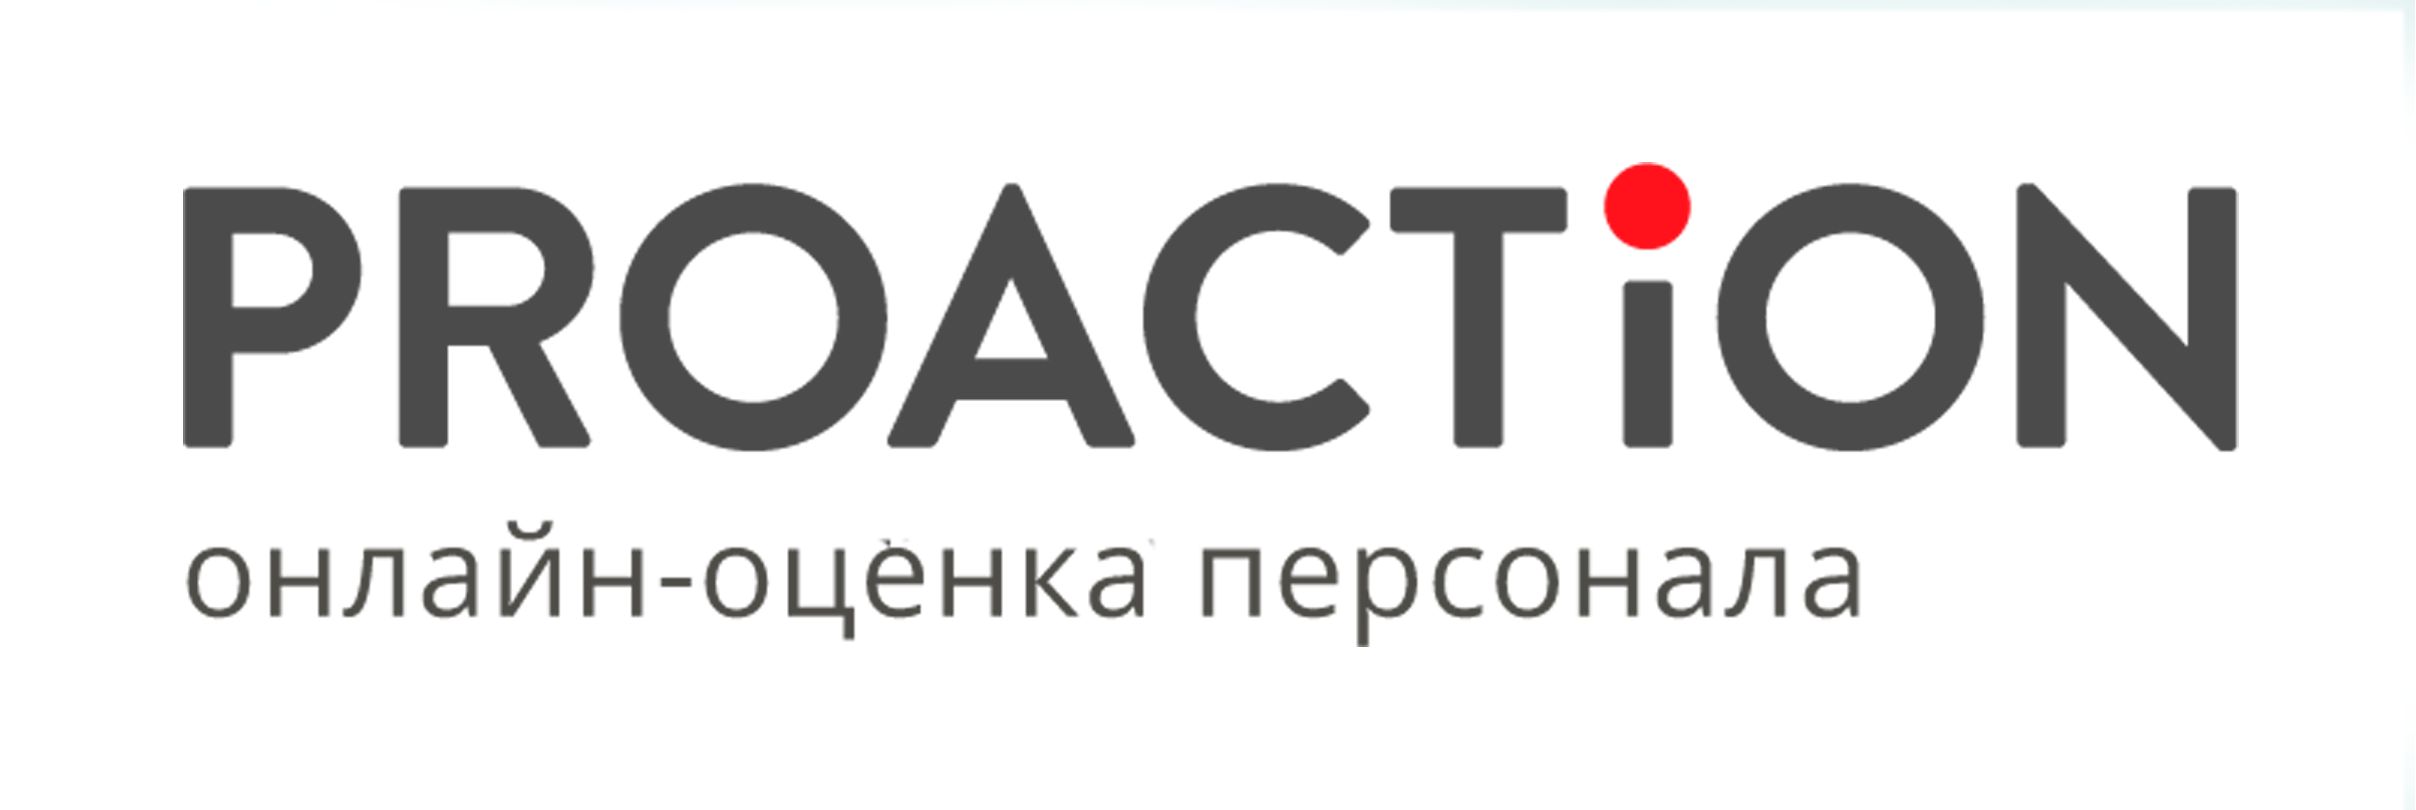 Логотип-Proaction-hrivanova